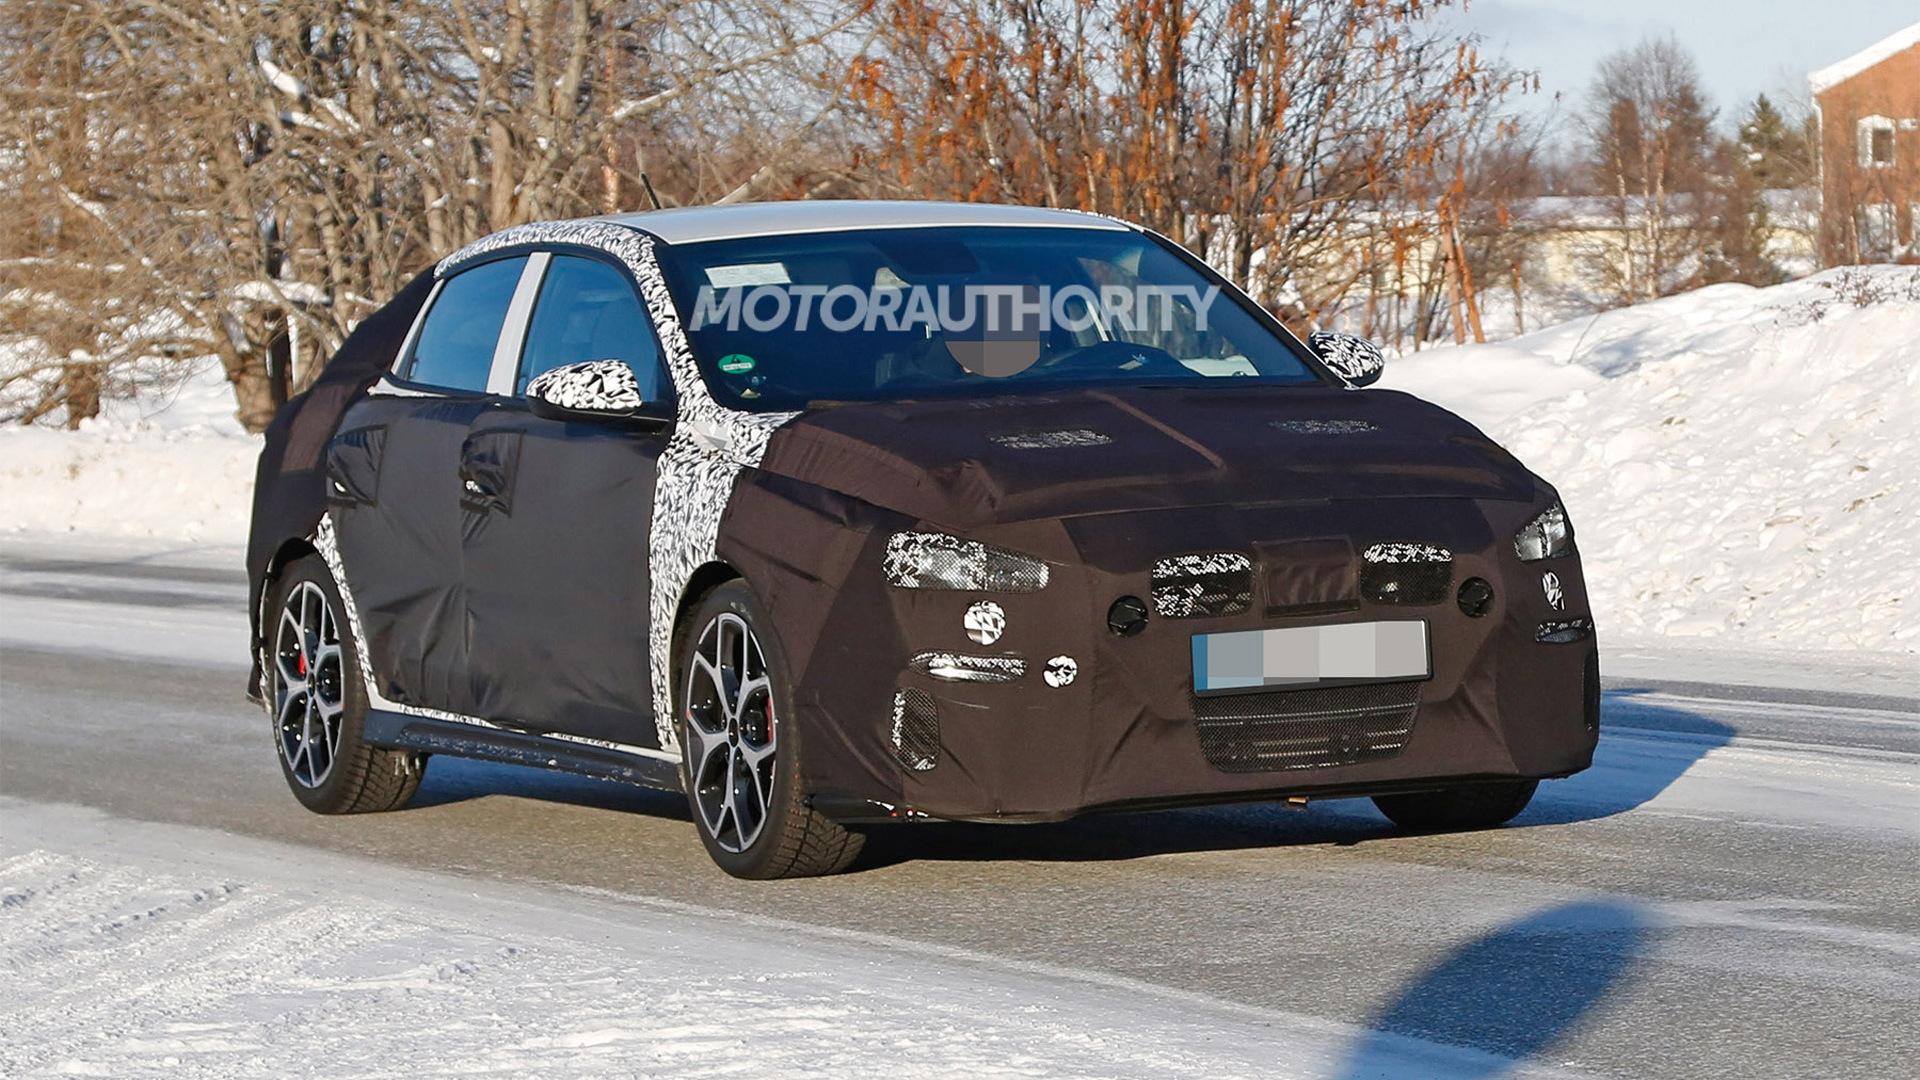 2019 Hyundai i30 Fastback N spy shots - Image via S. Baldauf/SB-Medien